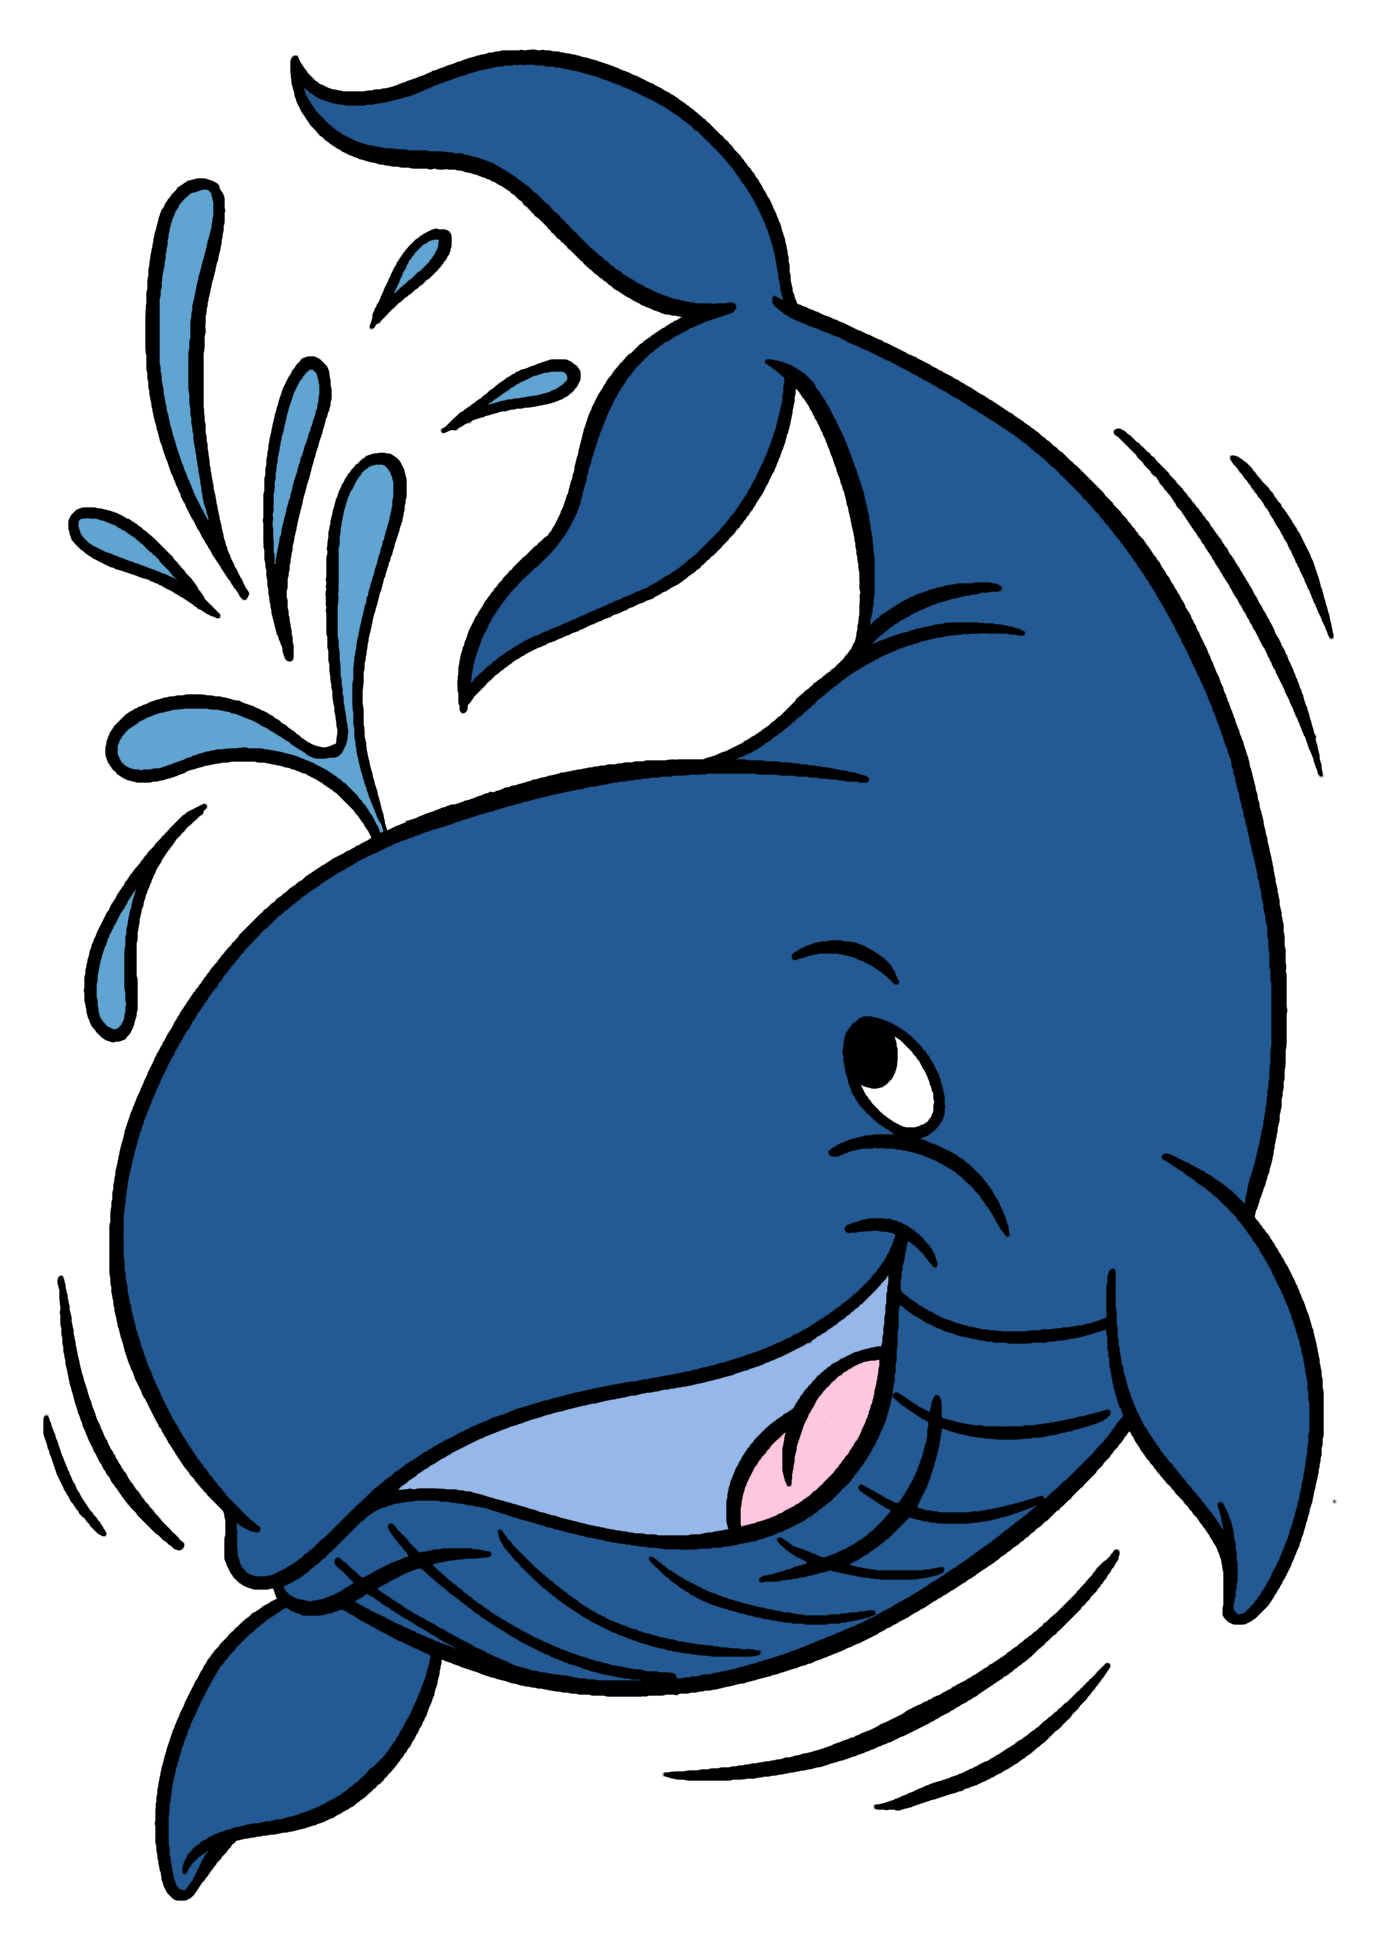 Whale clipart.